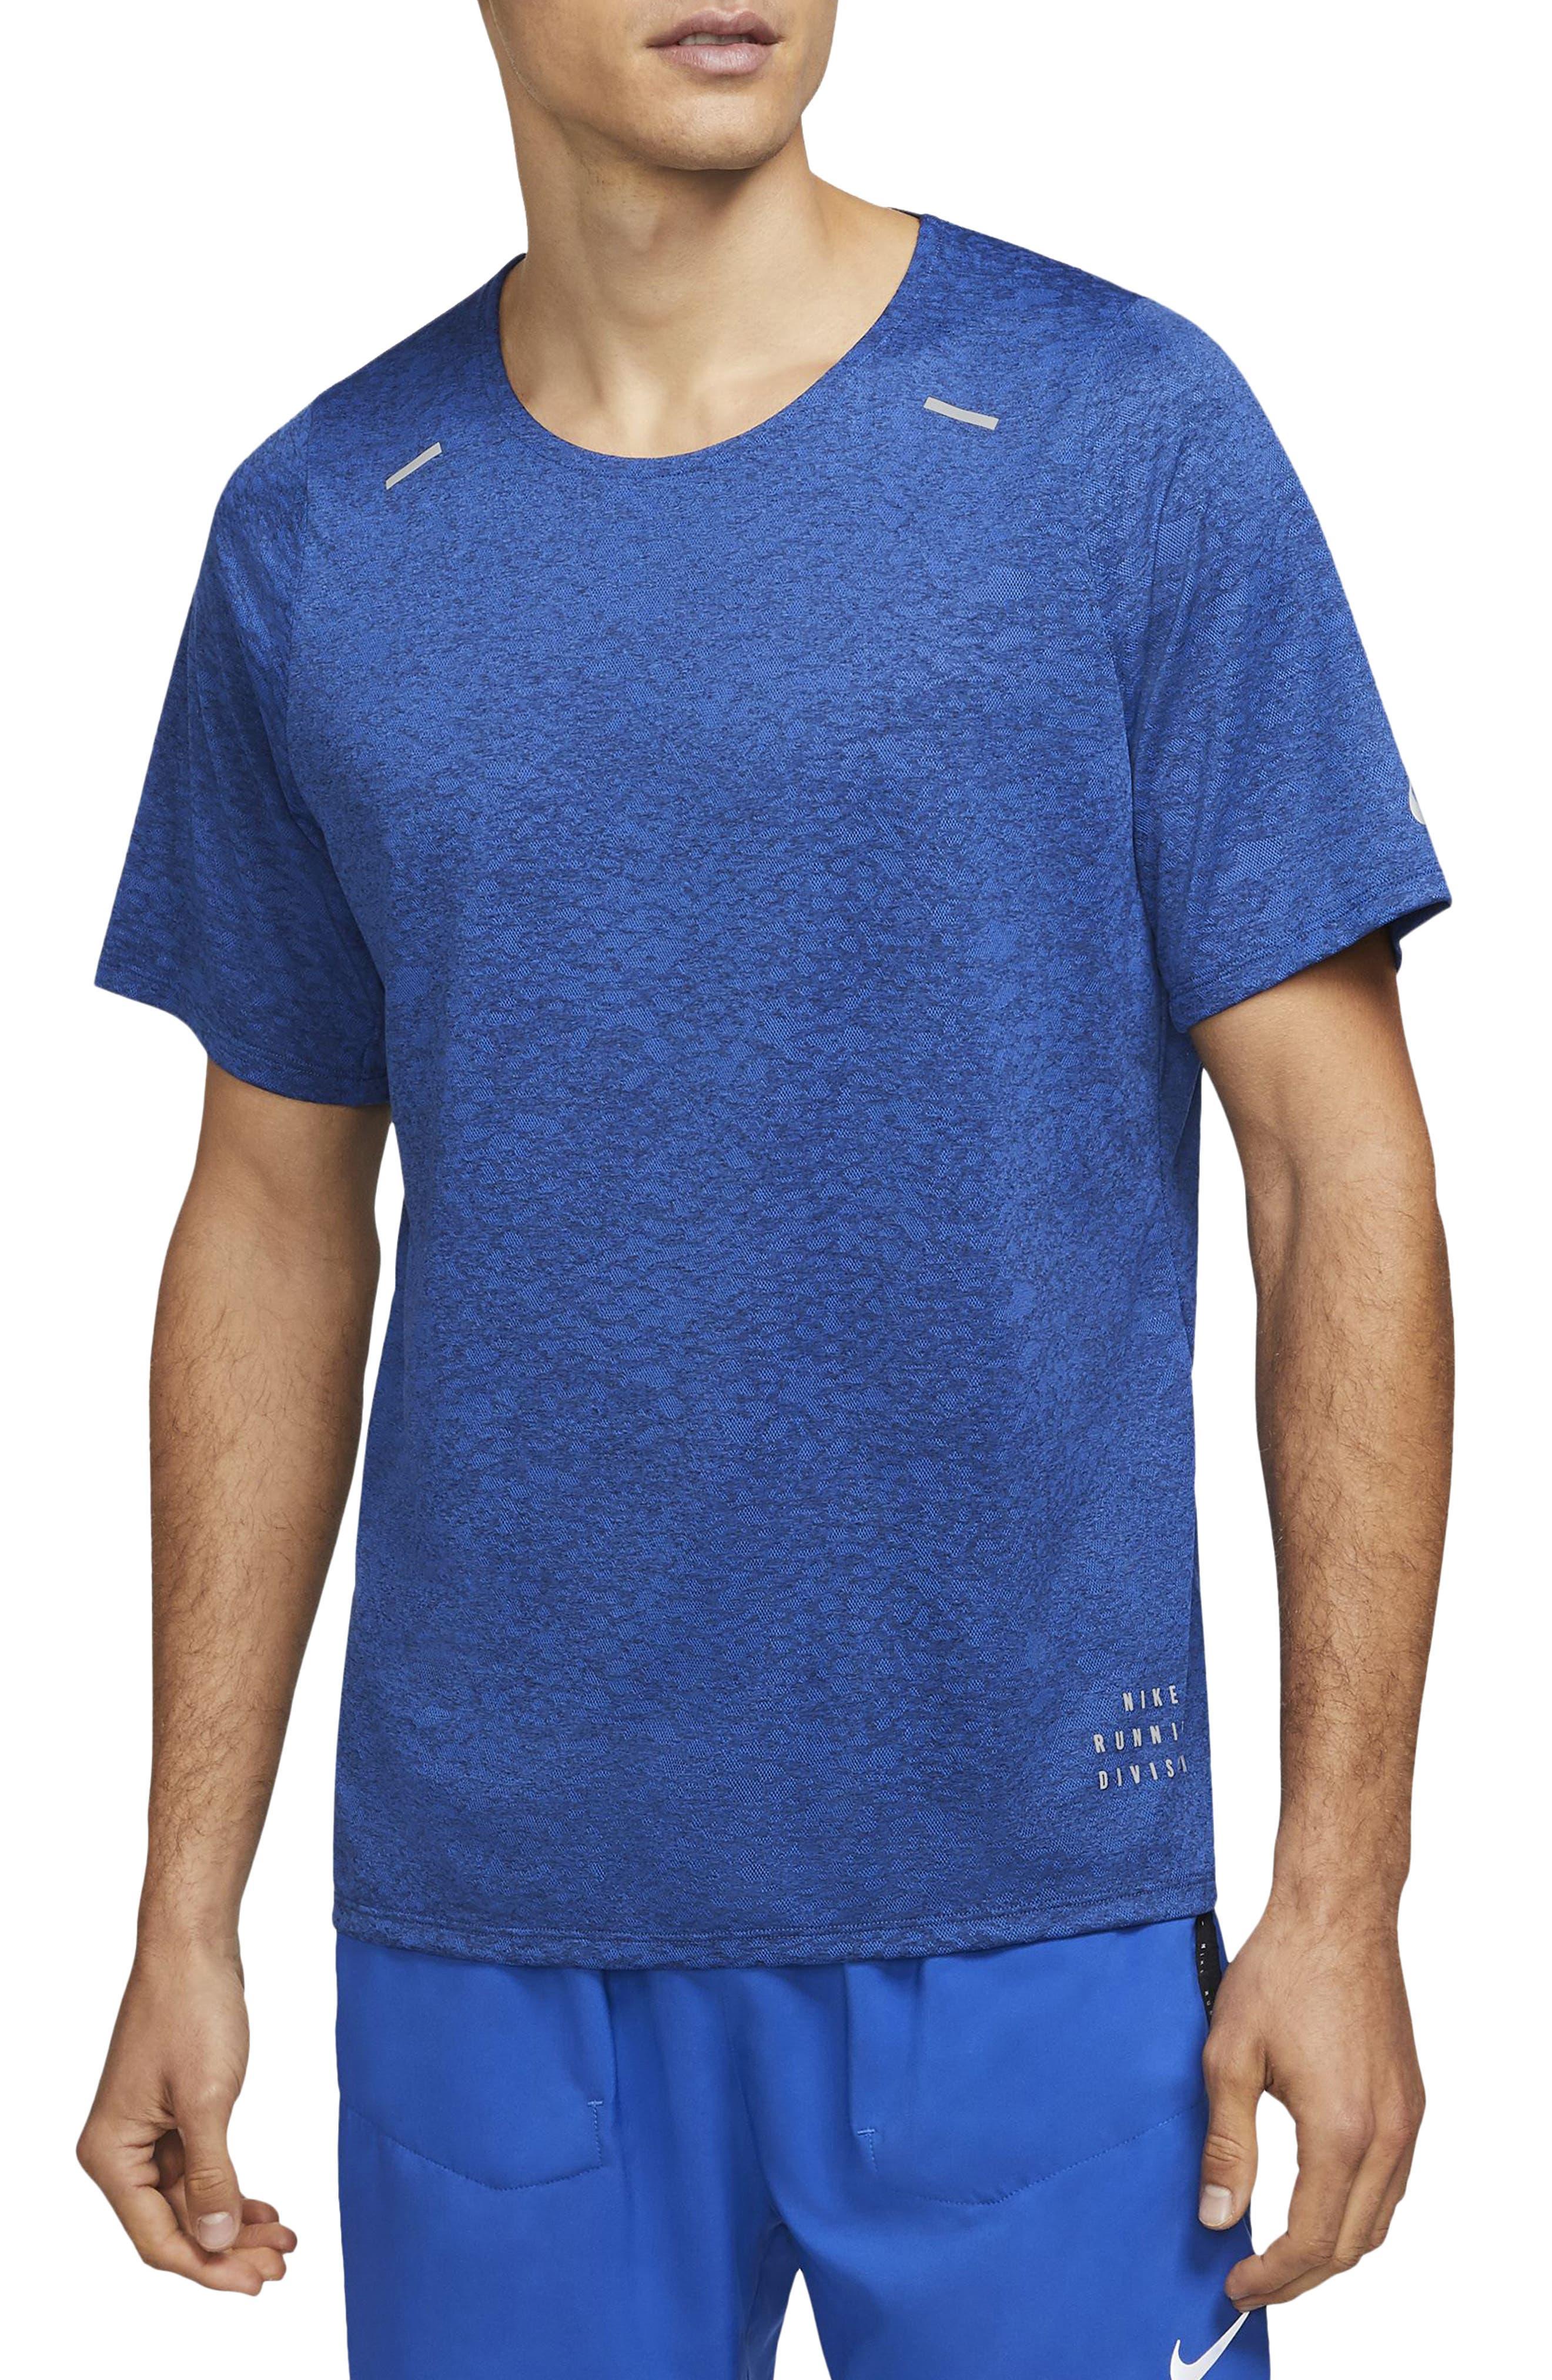 Men's Nike Rise 365 Run Division Running T-Shirt